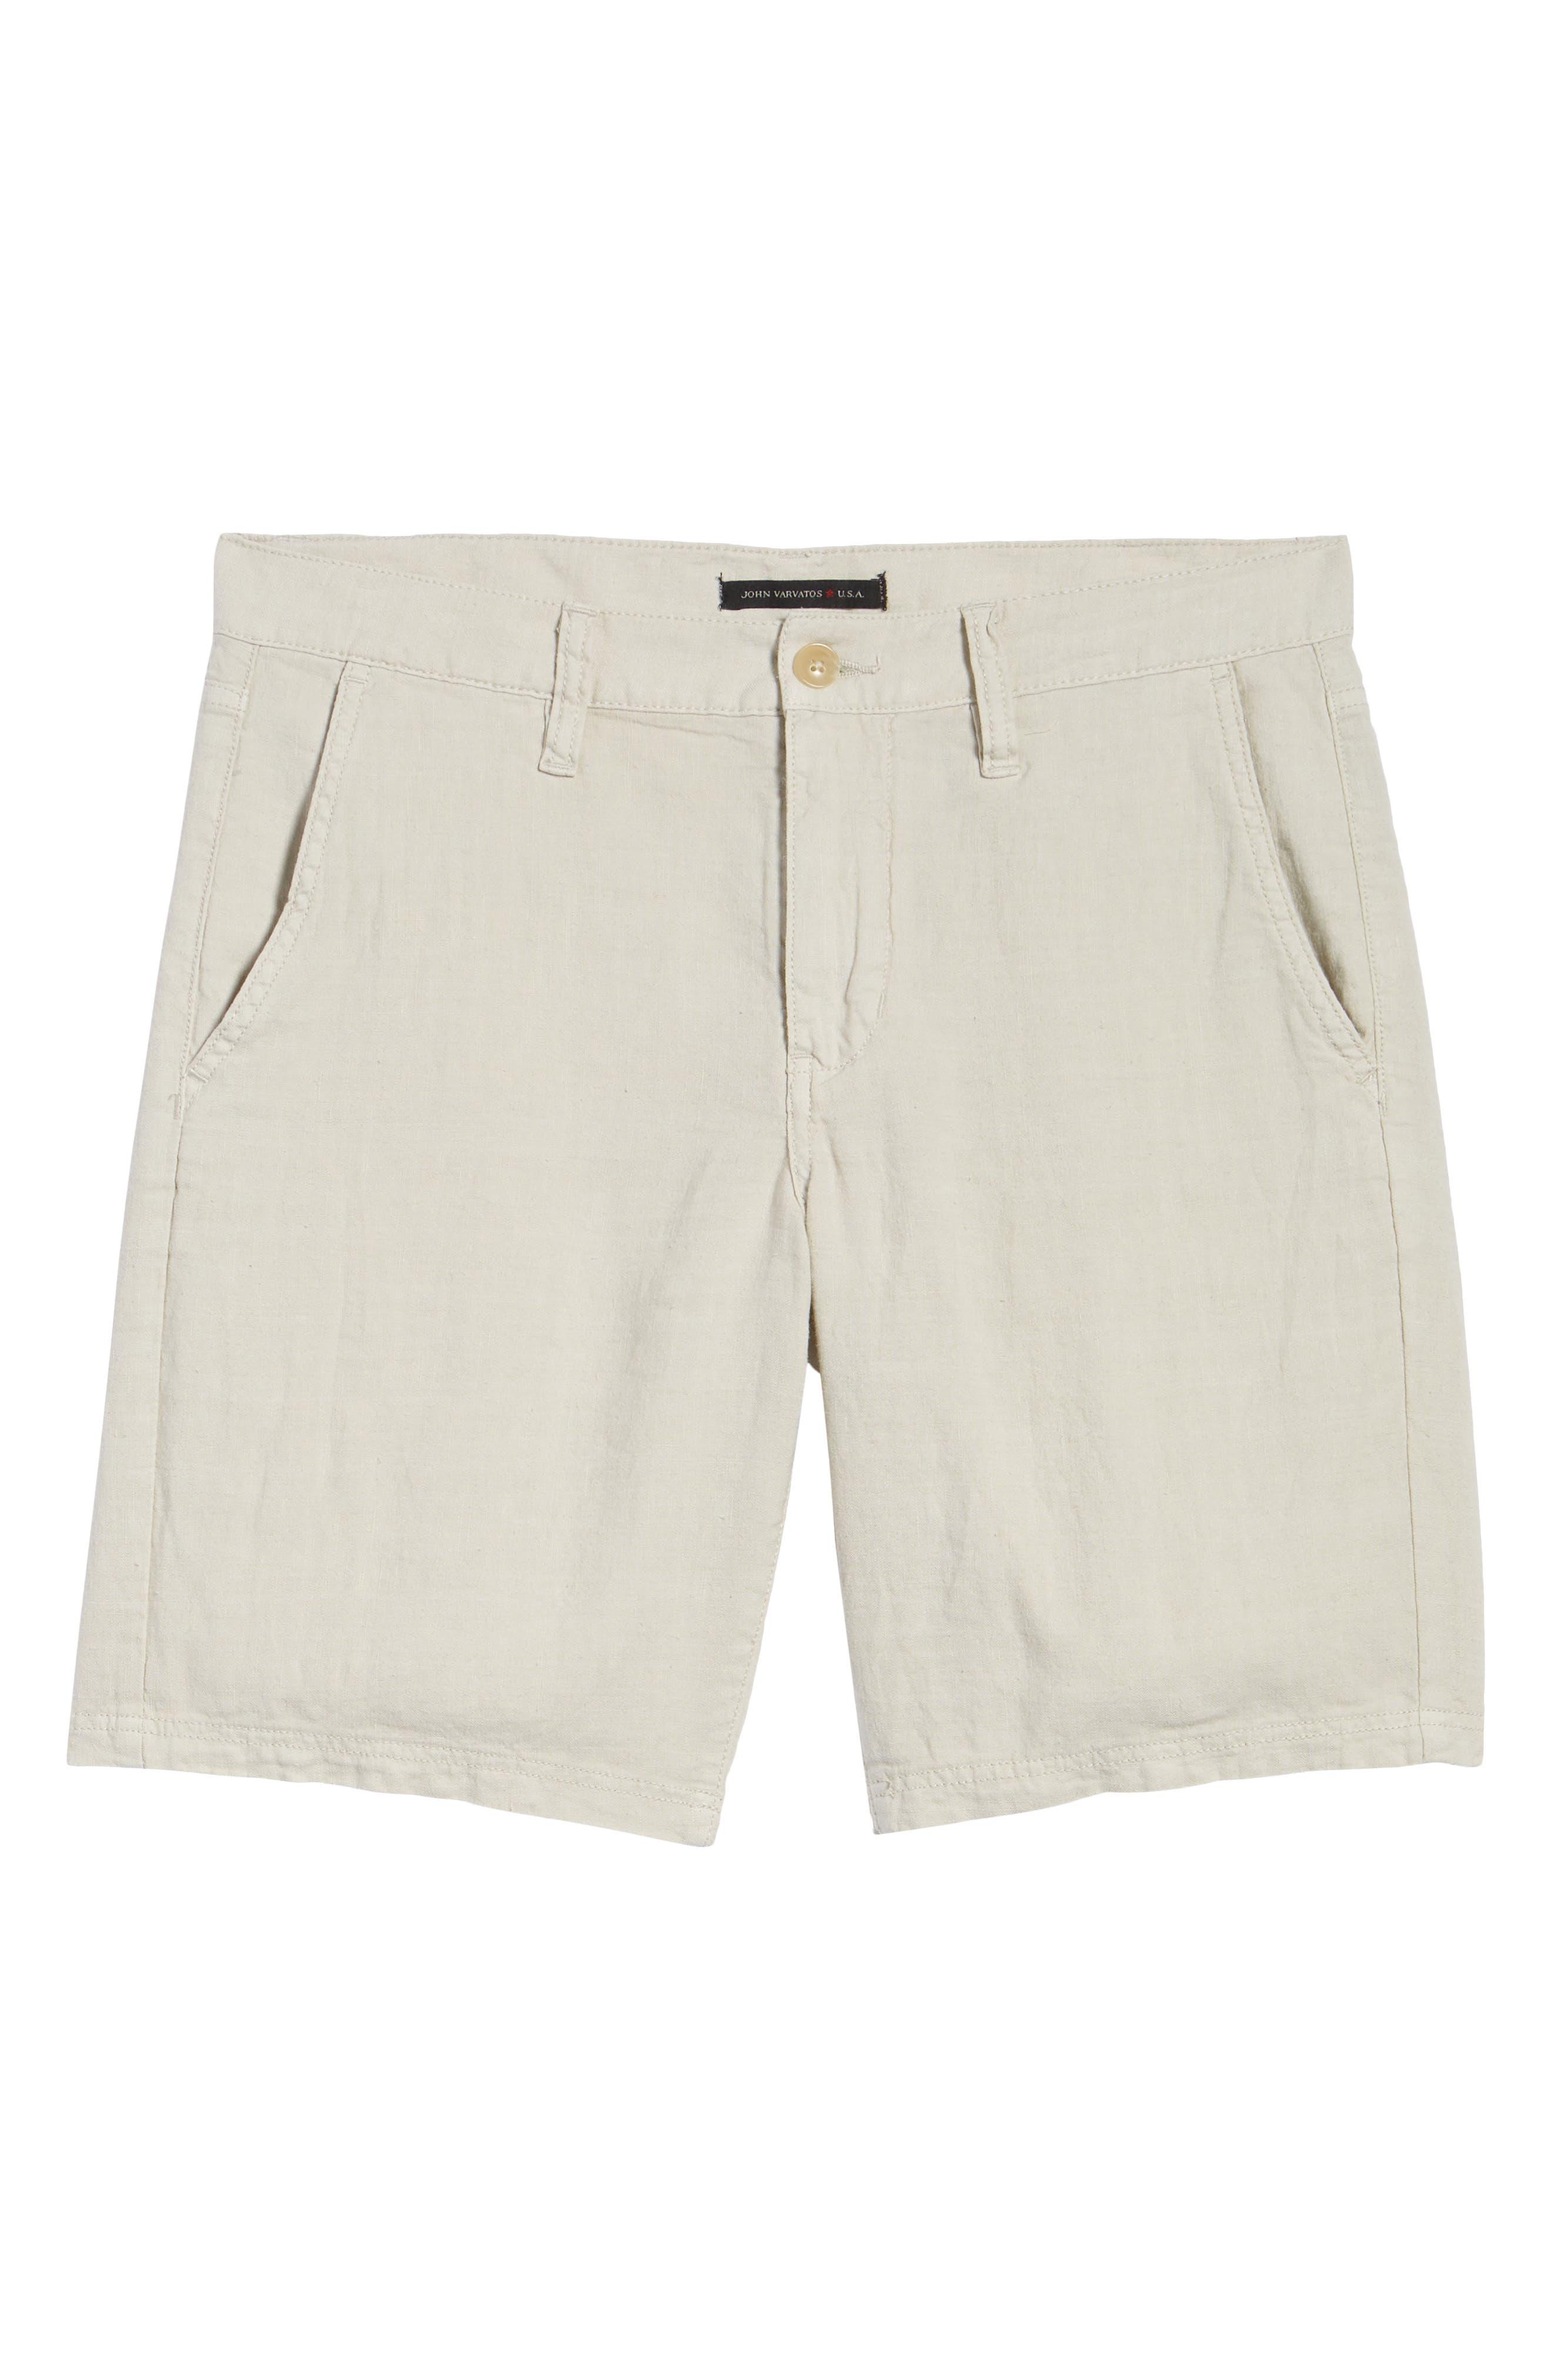 Linen Blend Shorts,                             Alternate thumbnail 6, color,                             FOSSIL GREY